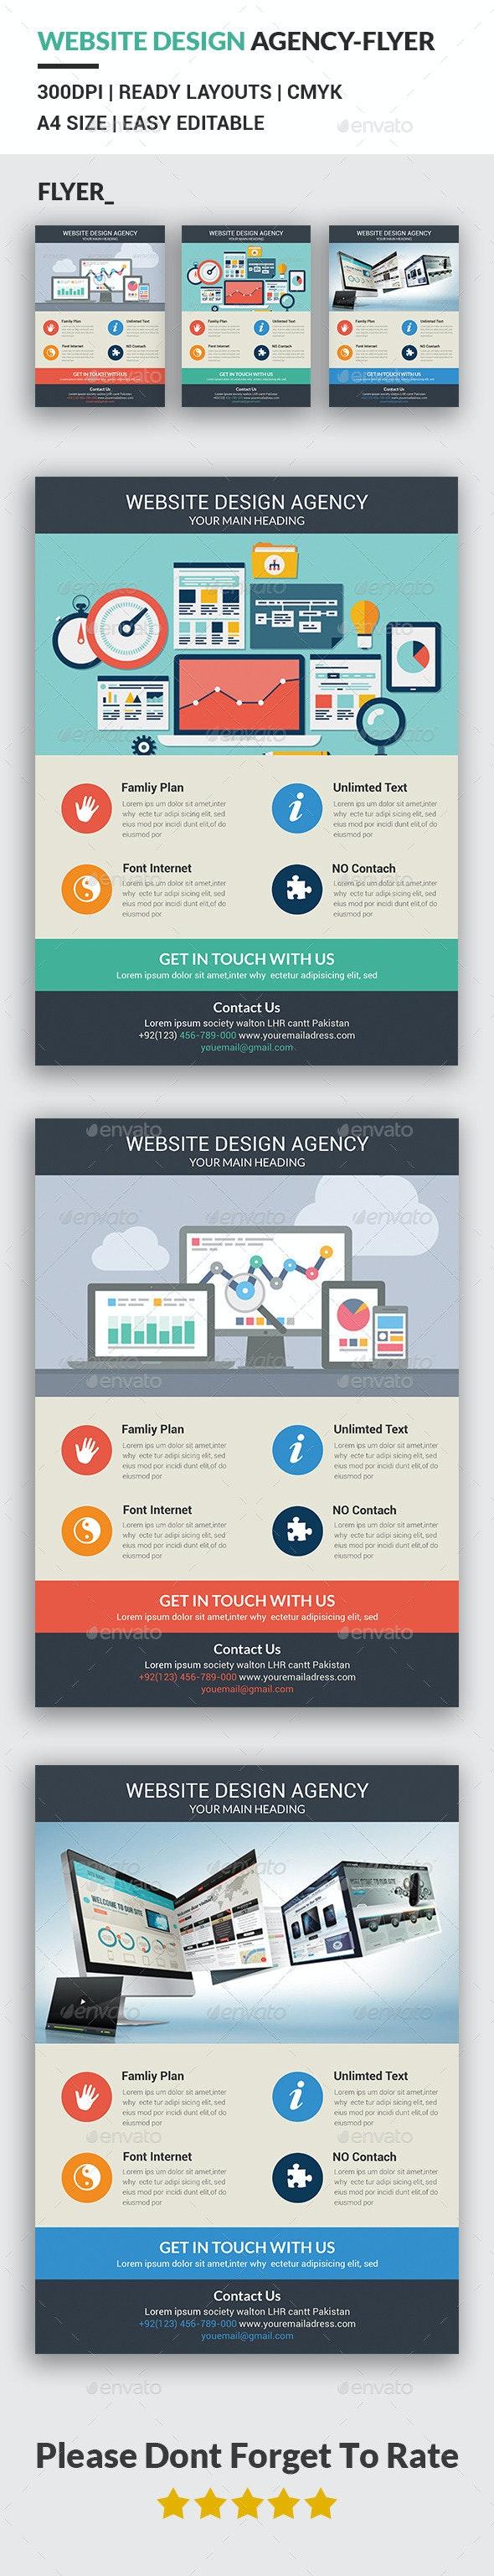 Website Design Agency Flyer Template - Corporate Flyers